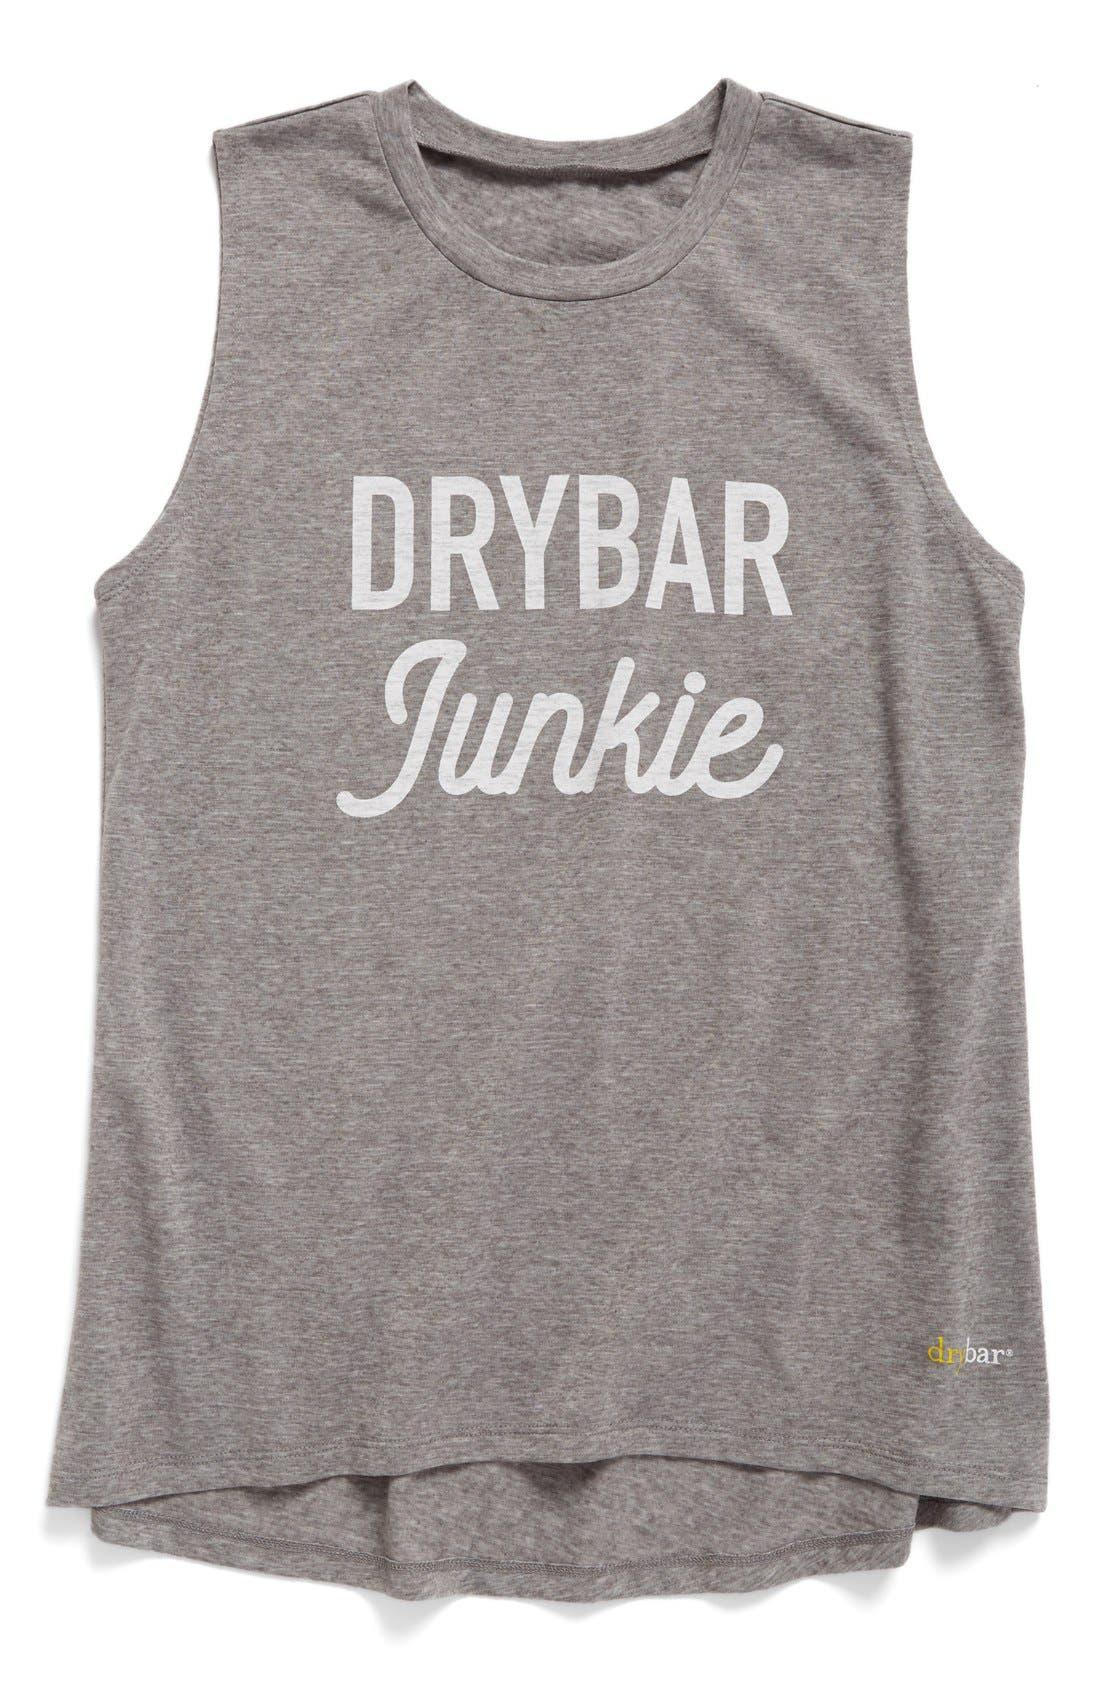 Drybar Capsule Drybar Junkie Tank (Limited Edition)